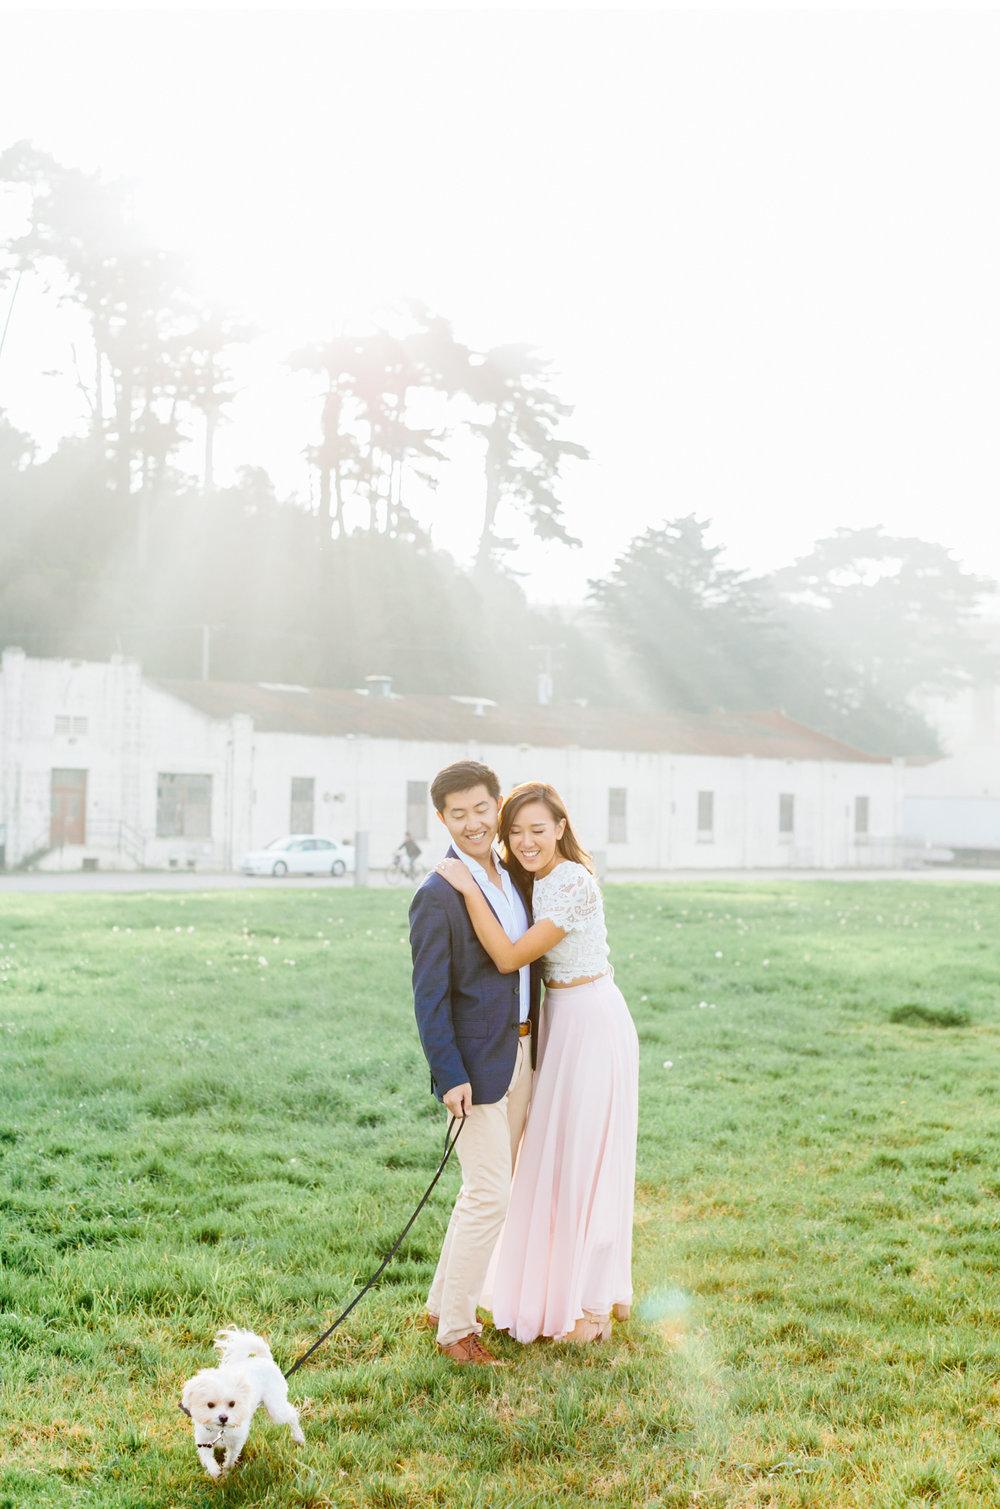 San-Francisco-Wedding-Photographer-Natalie-Schutt-Photography-Style-Me-Pretty_07.jpg